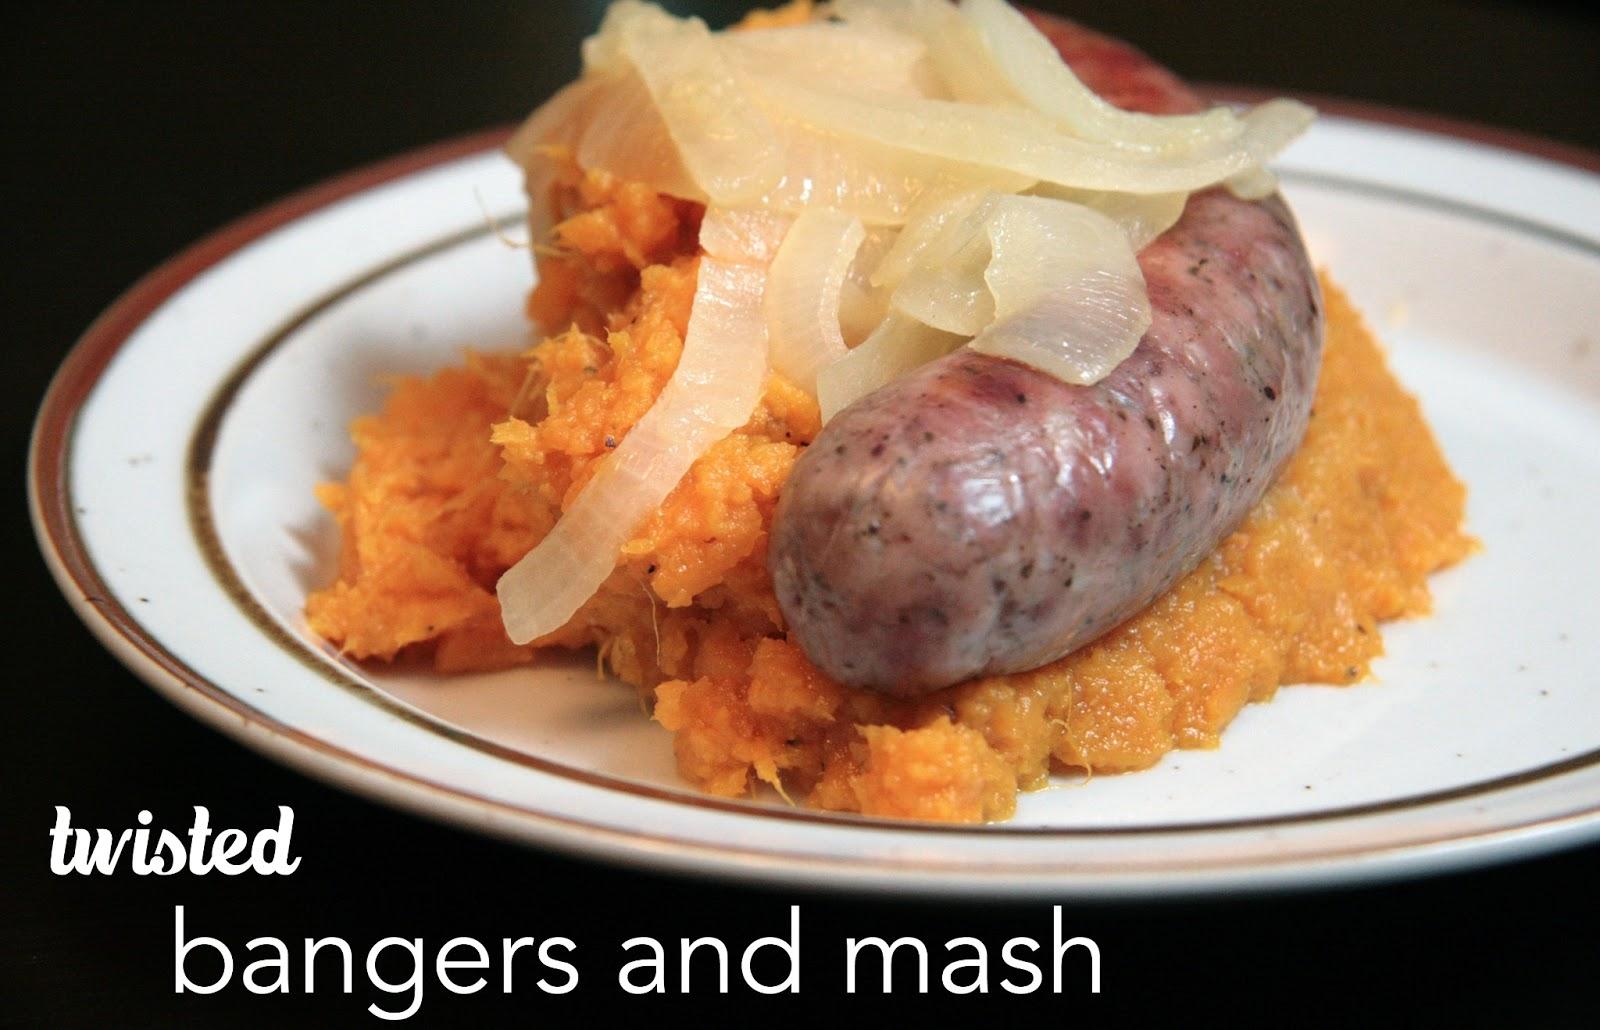 Twisted Bangers and Mash | Local Food Rocks